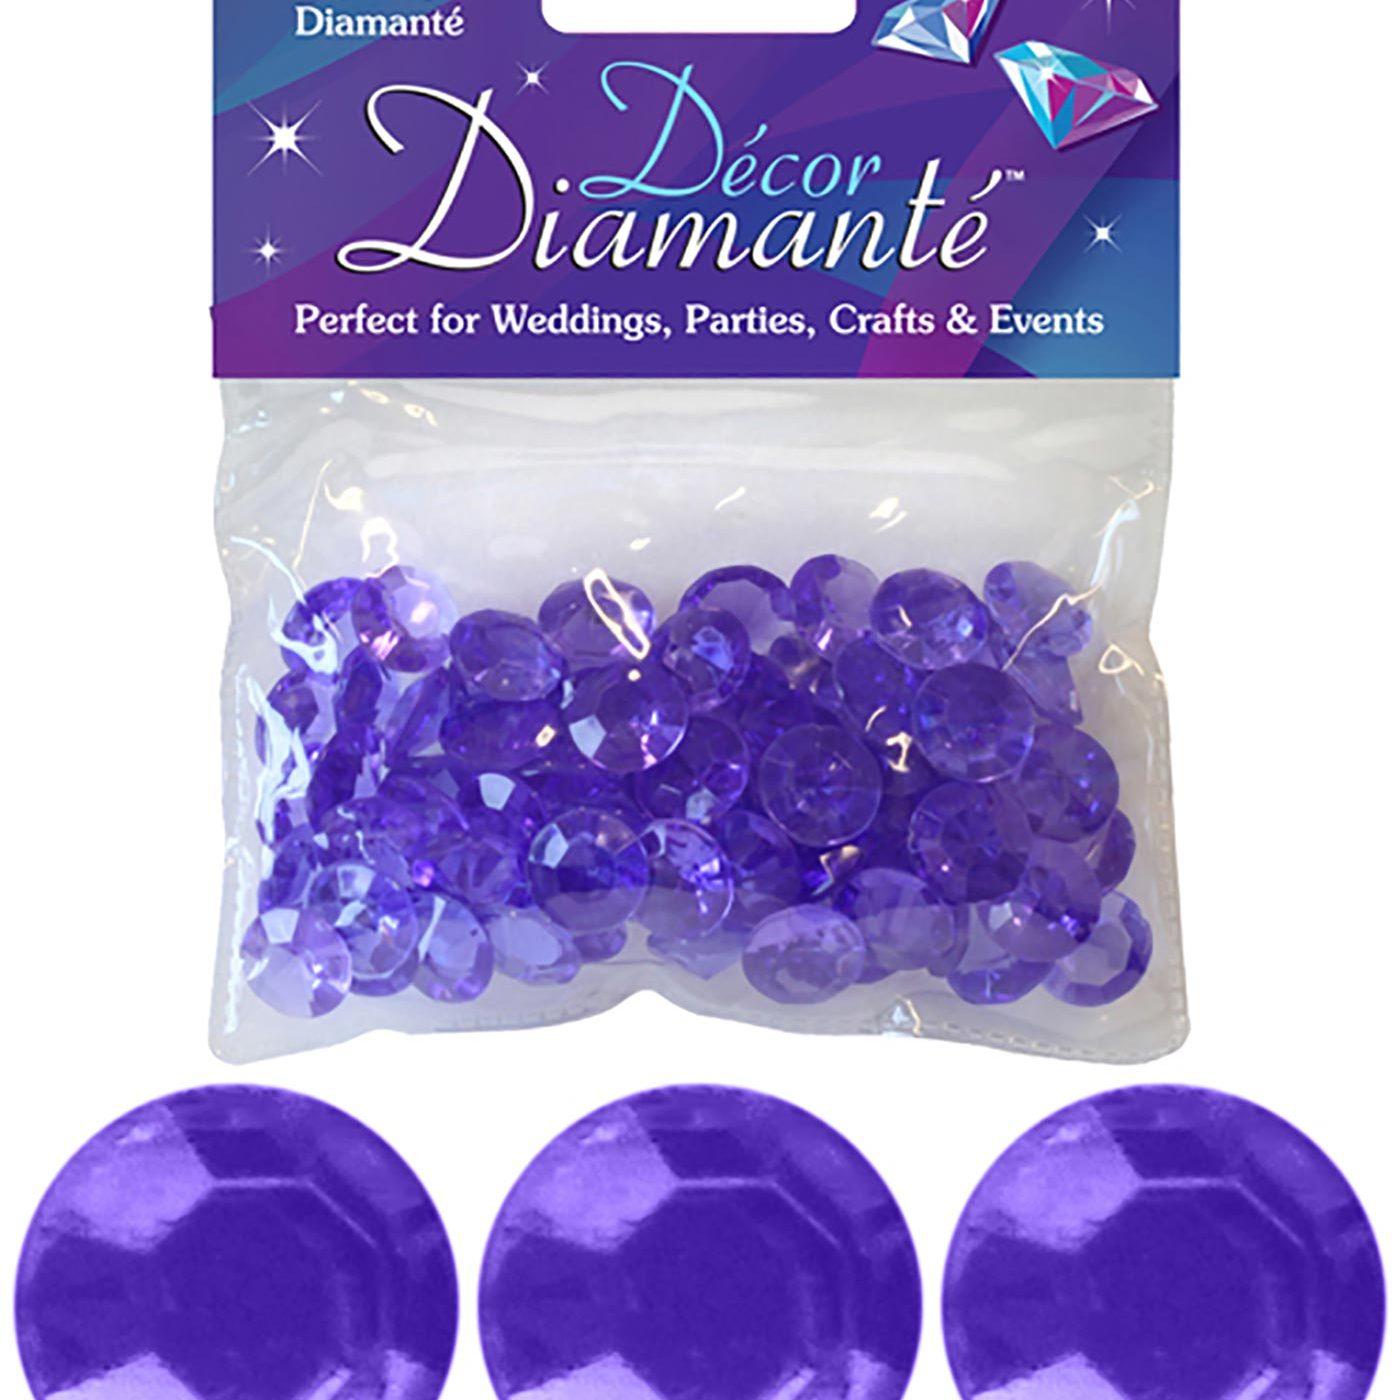 12mm Décor Diamante Diamonds 28g No.45 Lavender